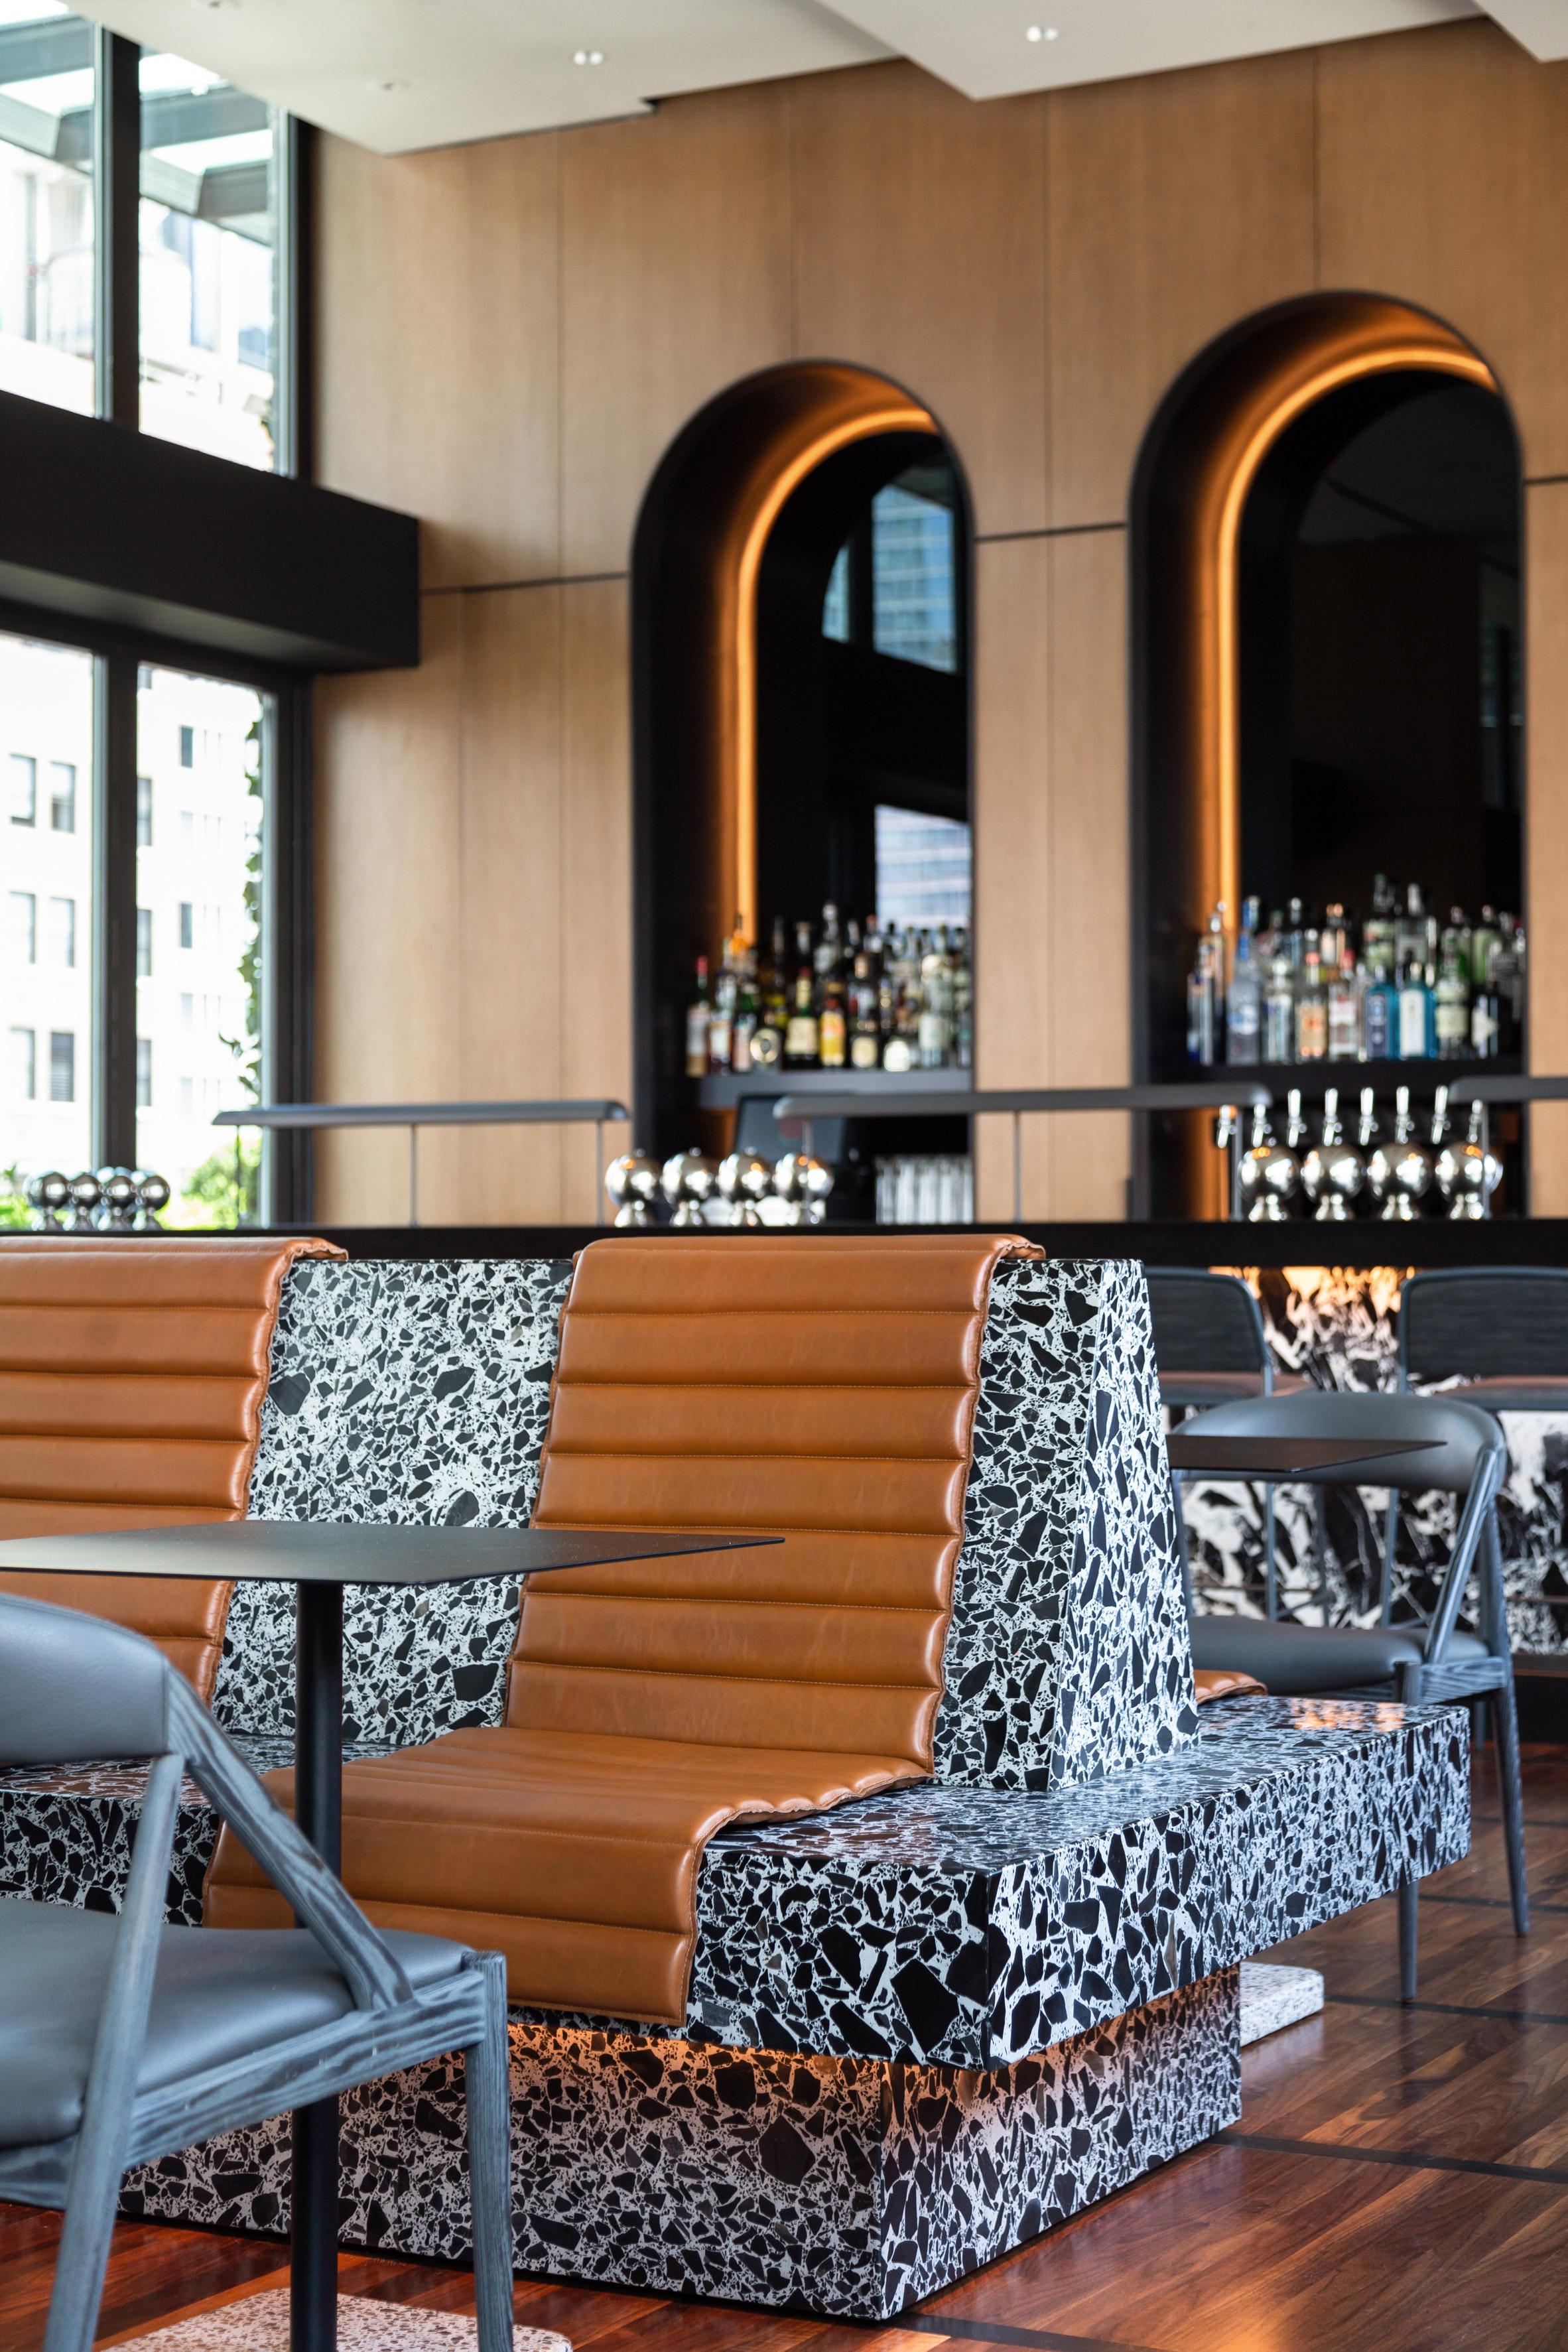 castell-bar-bhdm-interiors-ac-hotel-new-york-city-usa_dezeen_2364_col_4.jpg